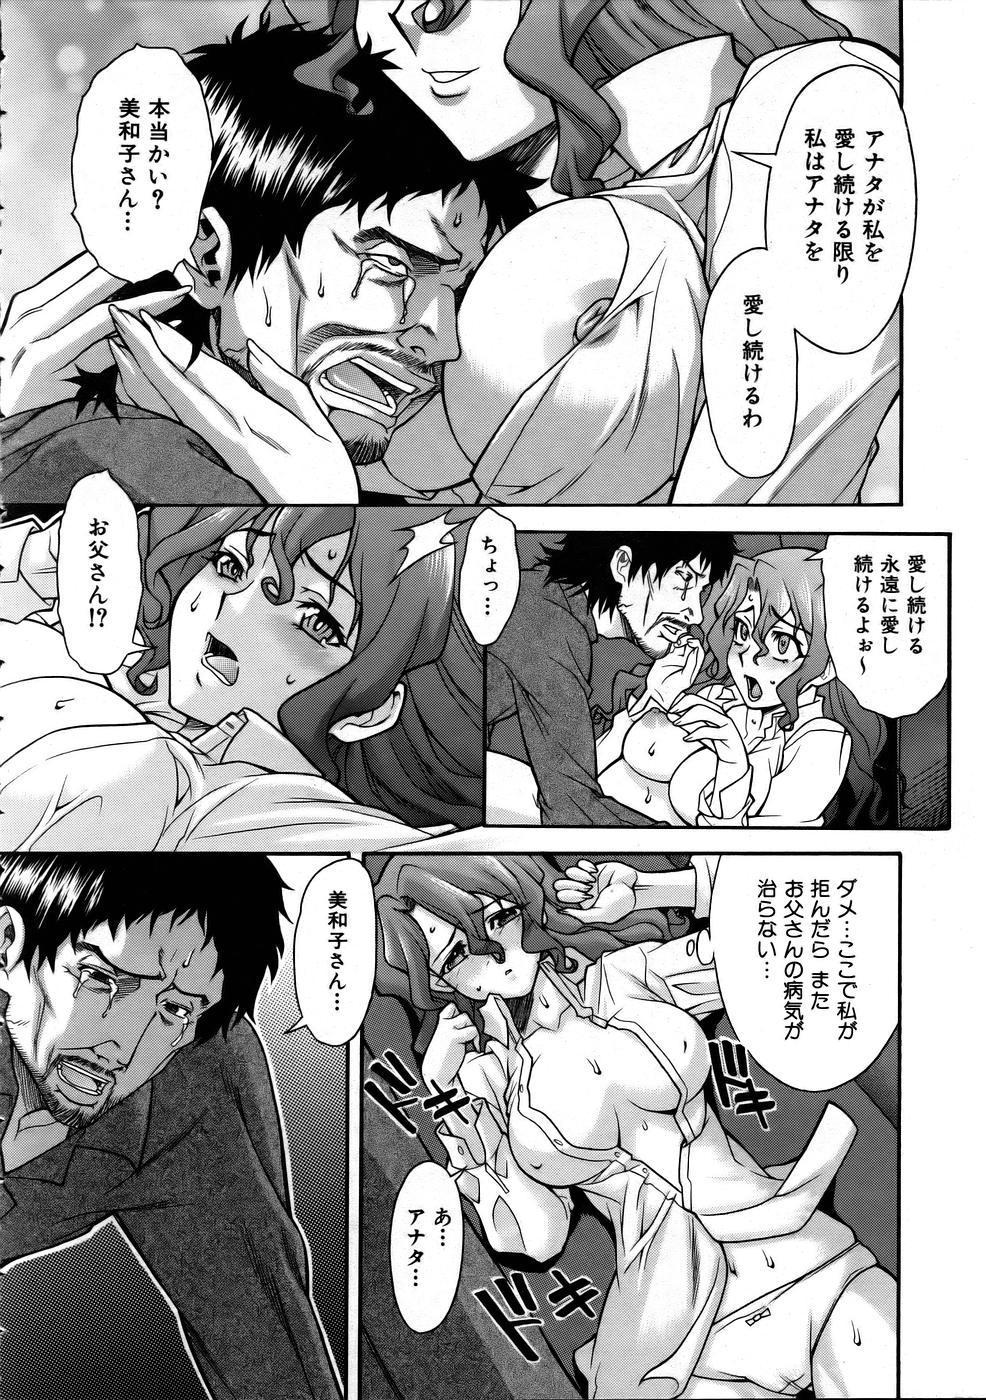 COMIC AUN 2005-10 Vol. 113 143